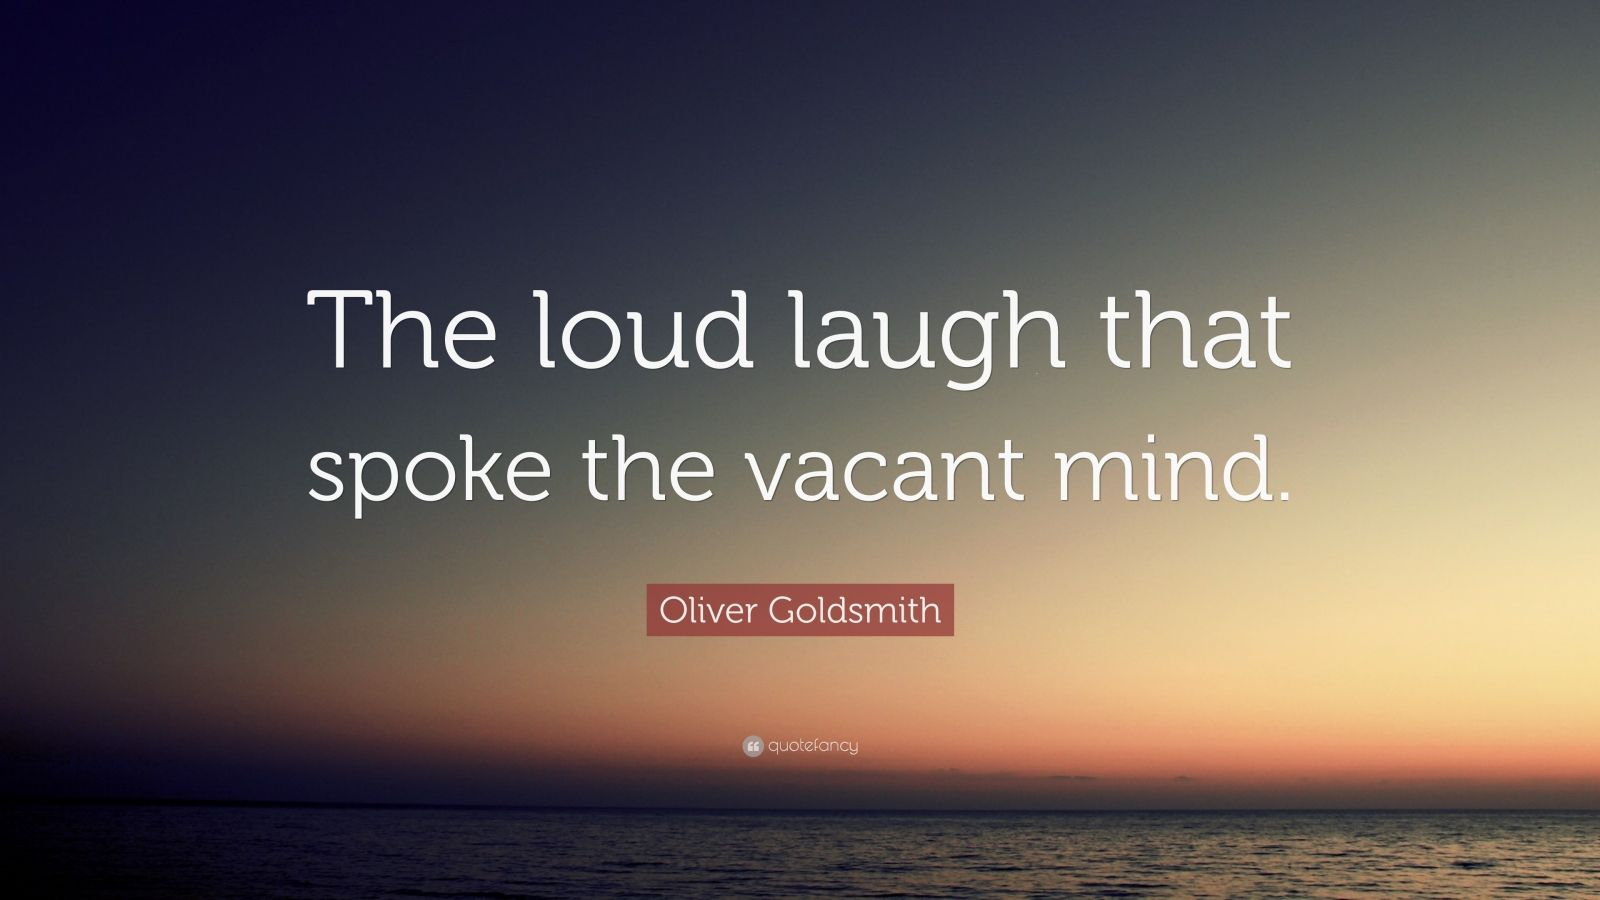 Loud Laugh Bespeaks Vacant Mind